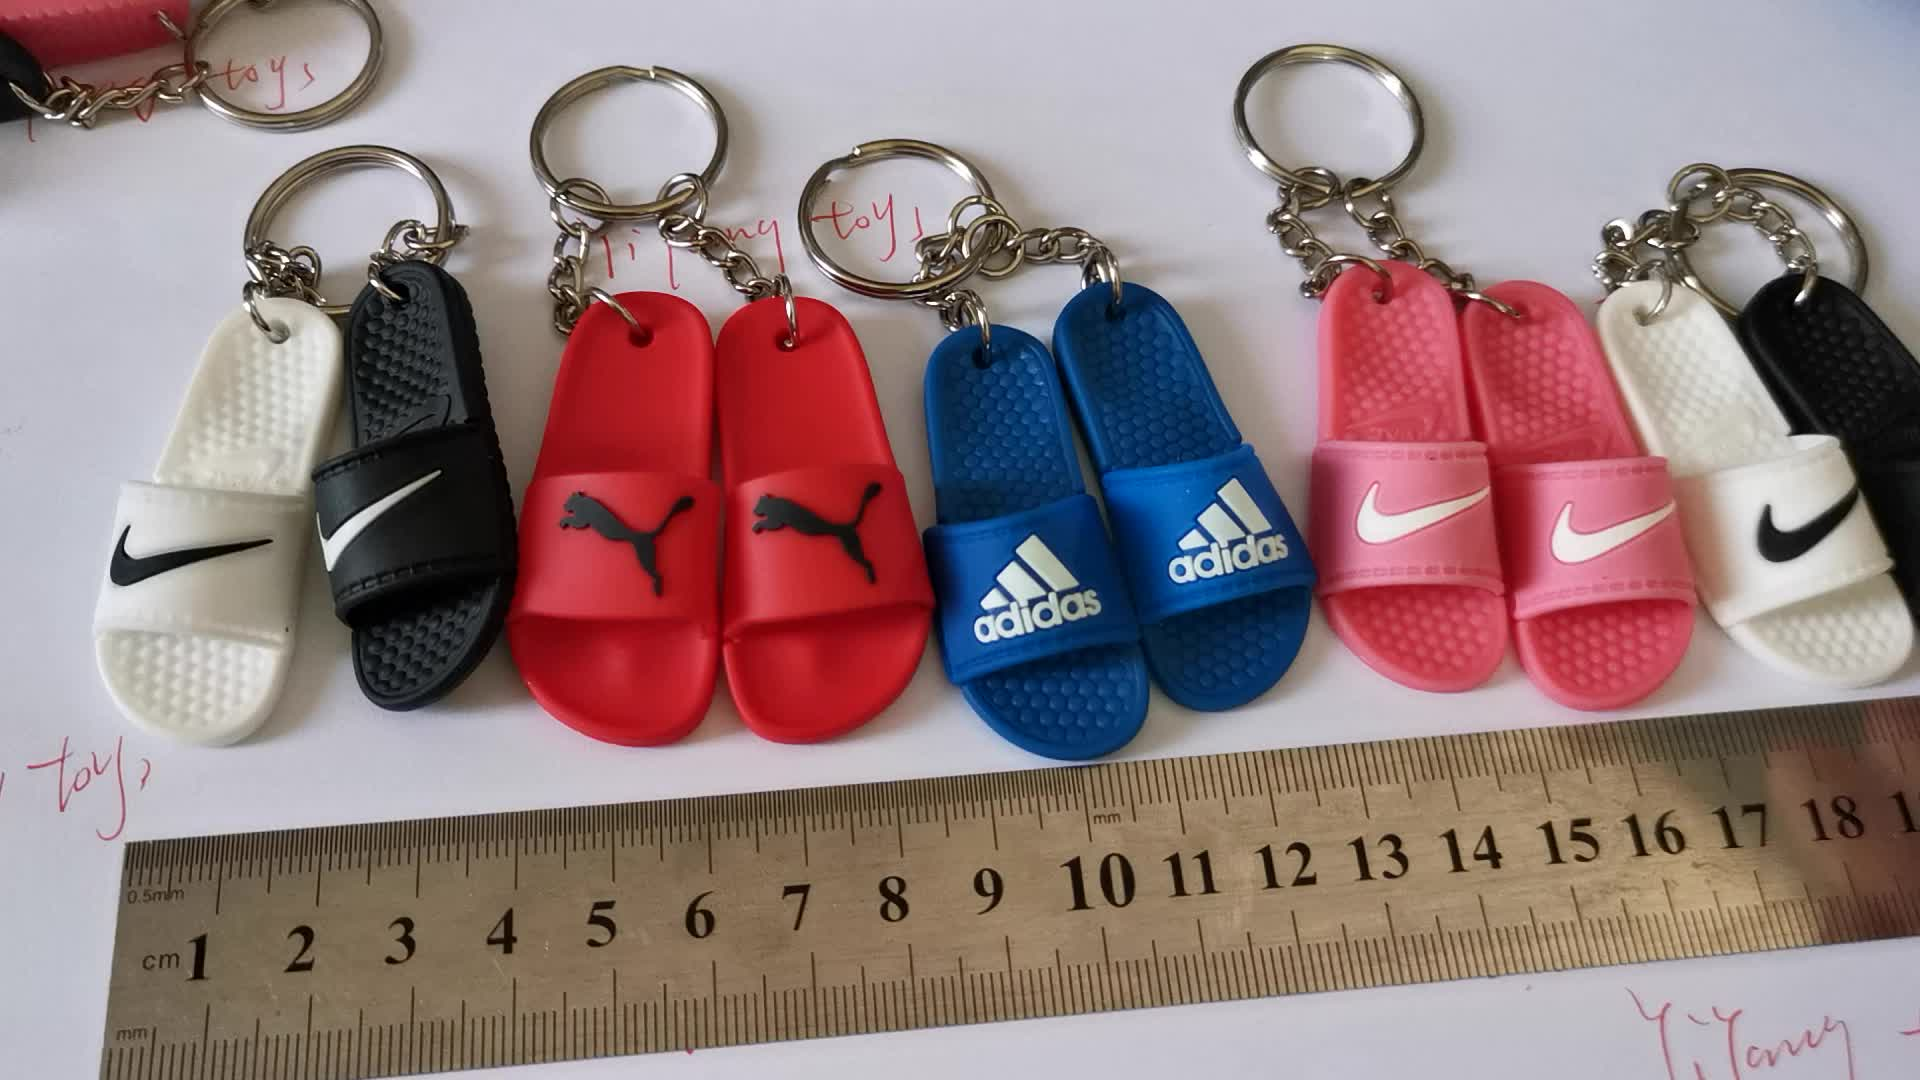 Murah Grosir Sandal Gantungan Kunci Bahan PVC Lembut 3D Sandal Gantungan Kunci 3D Mini Sepatu Mesin Boneka Hadiah Kecil Massal Sepatu gantungan Kunci